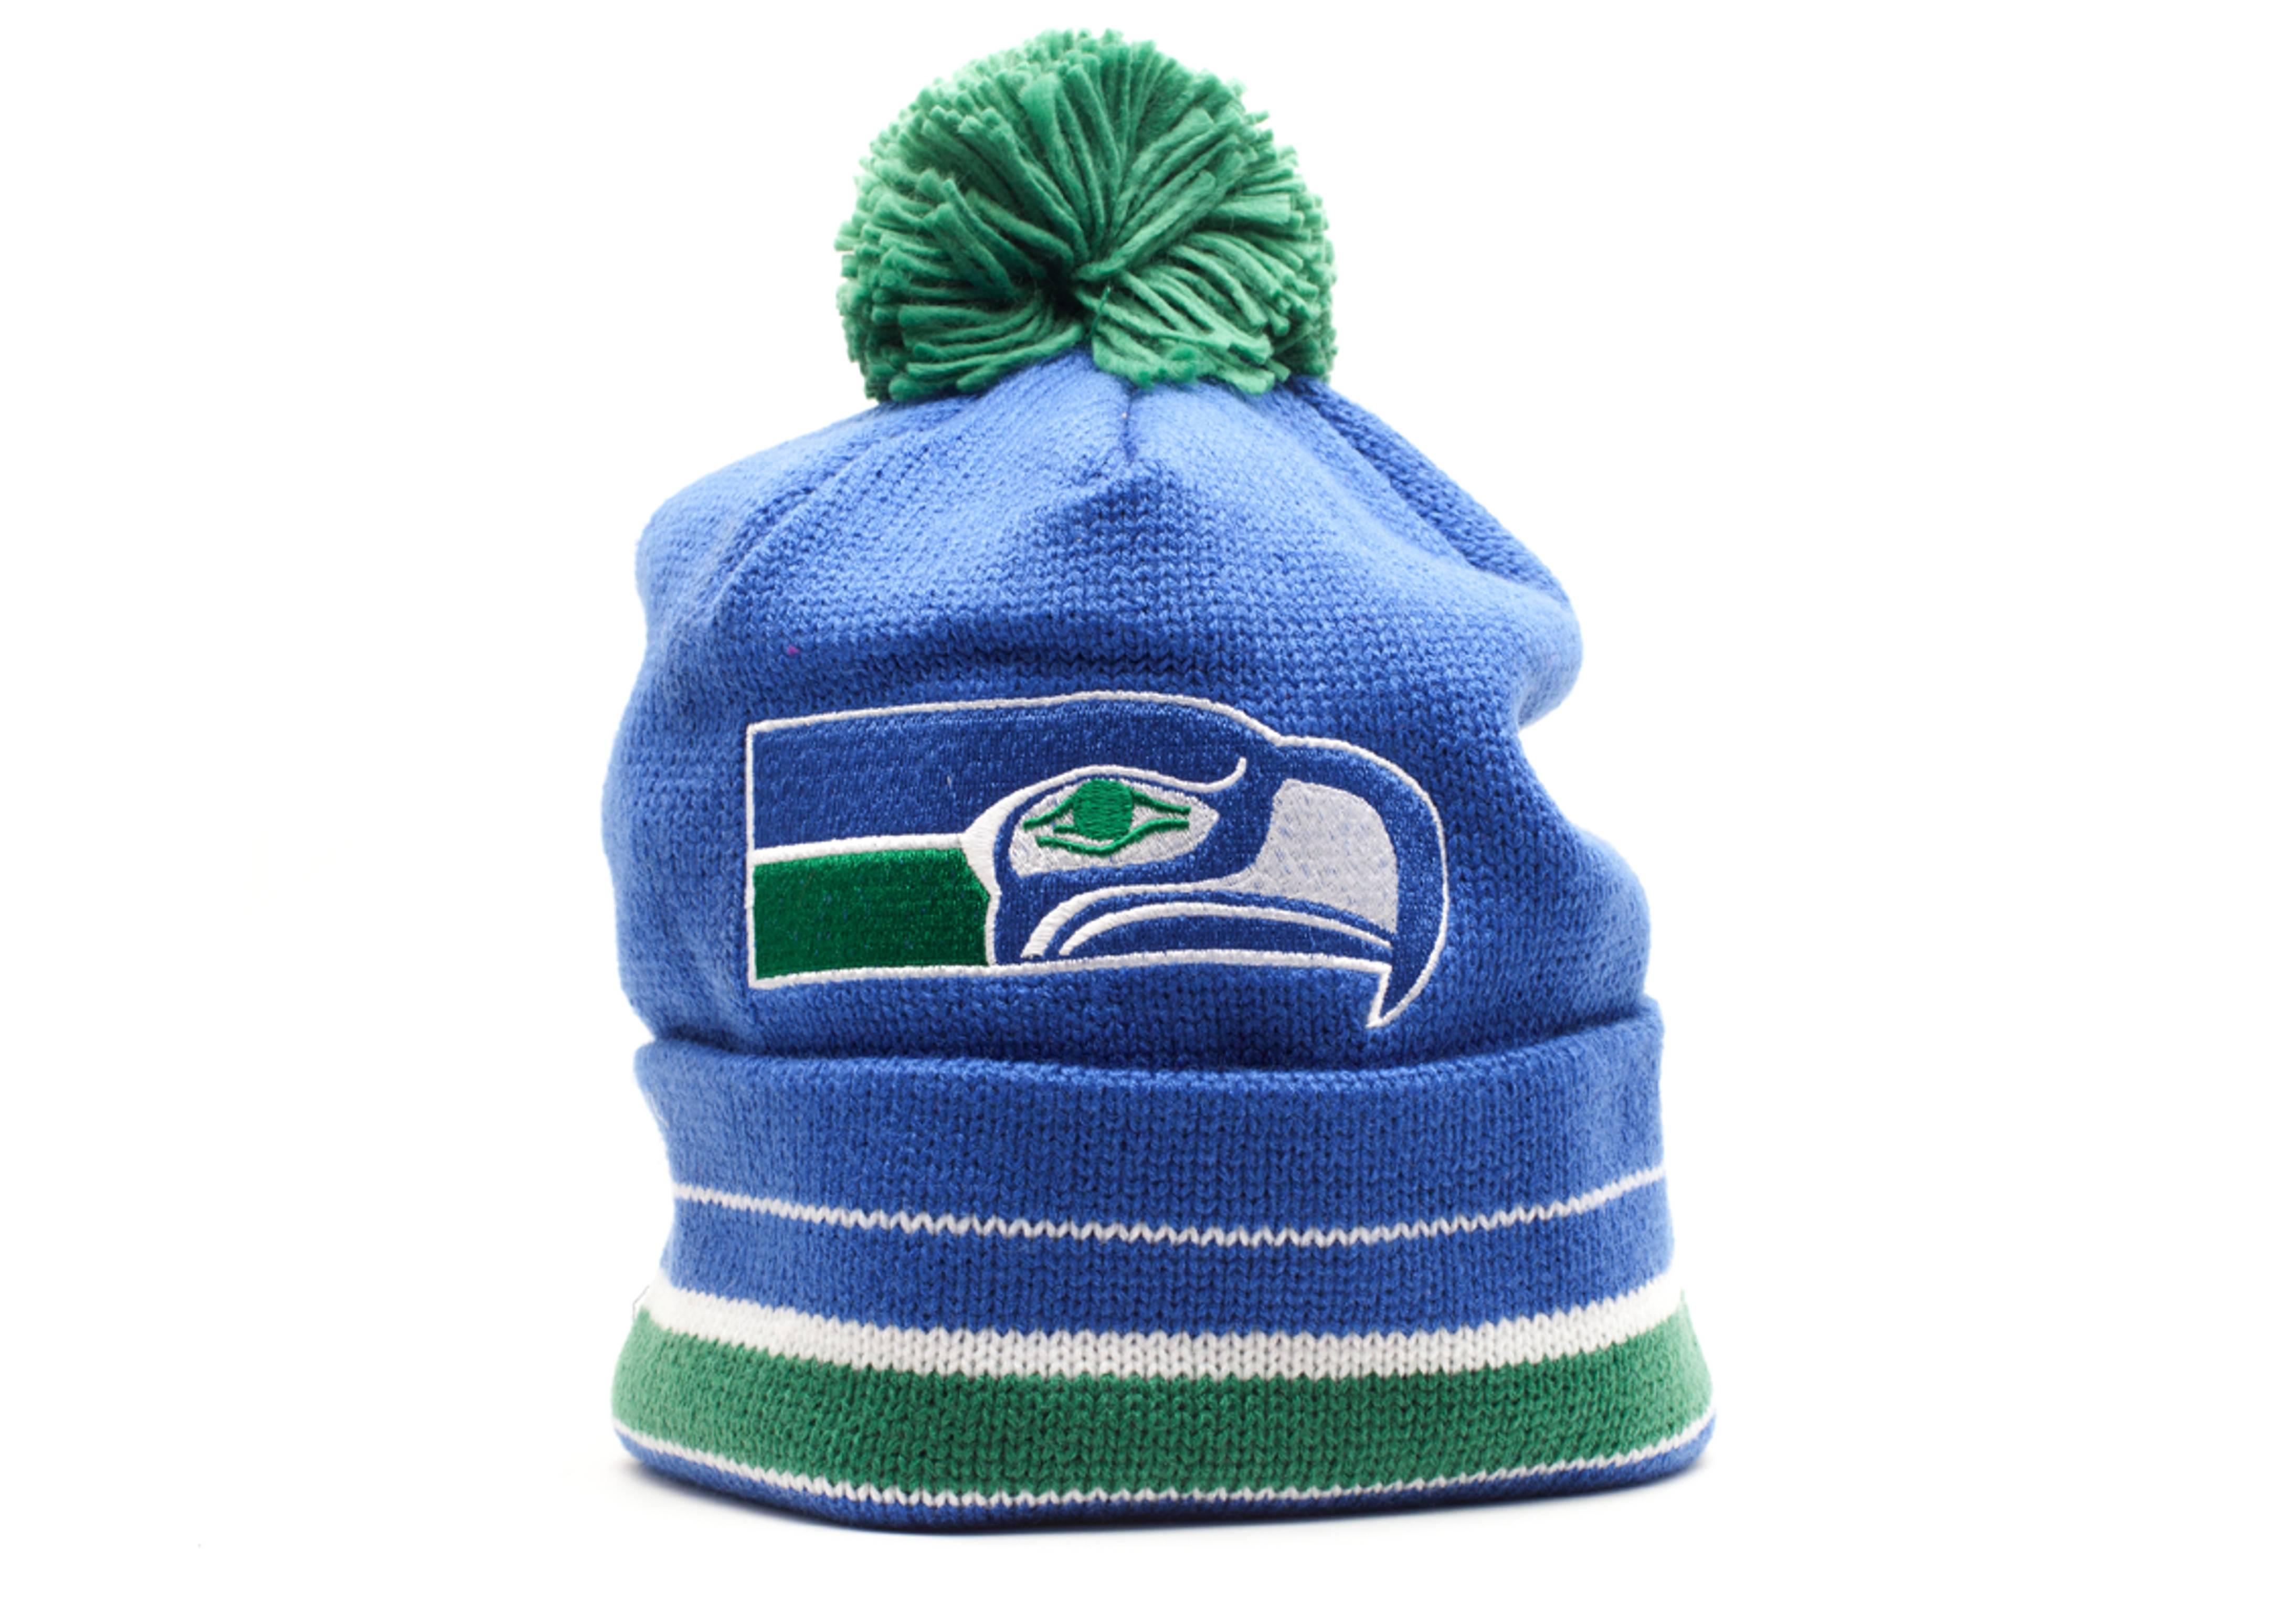 c416a07a Seattle Seahawks Cuffed Pom Knit Beanie - Mitchell & Ness ...